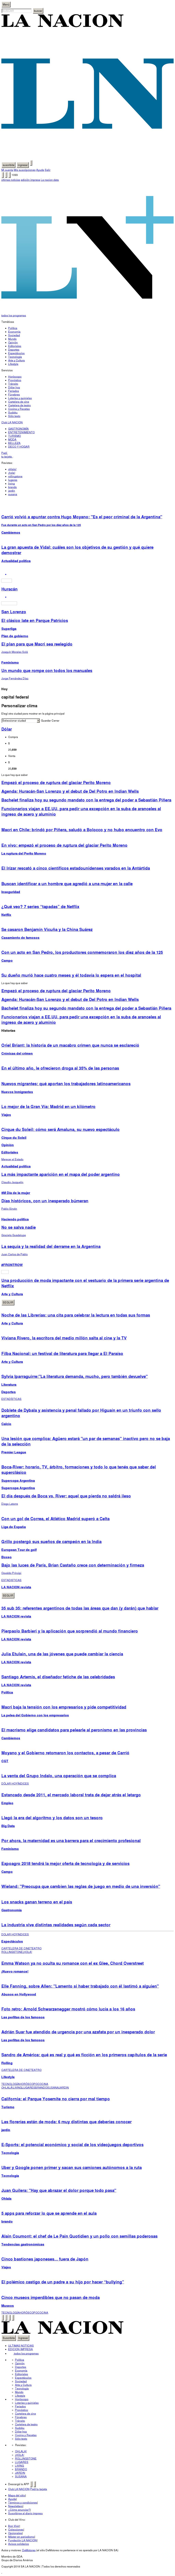 lanacion.com at Sunday March 11, 2018, 9:06 p.m. UTC